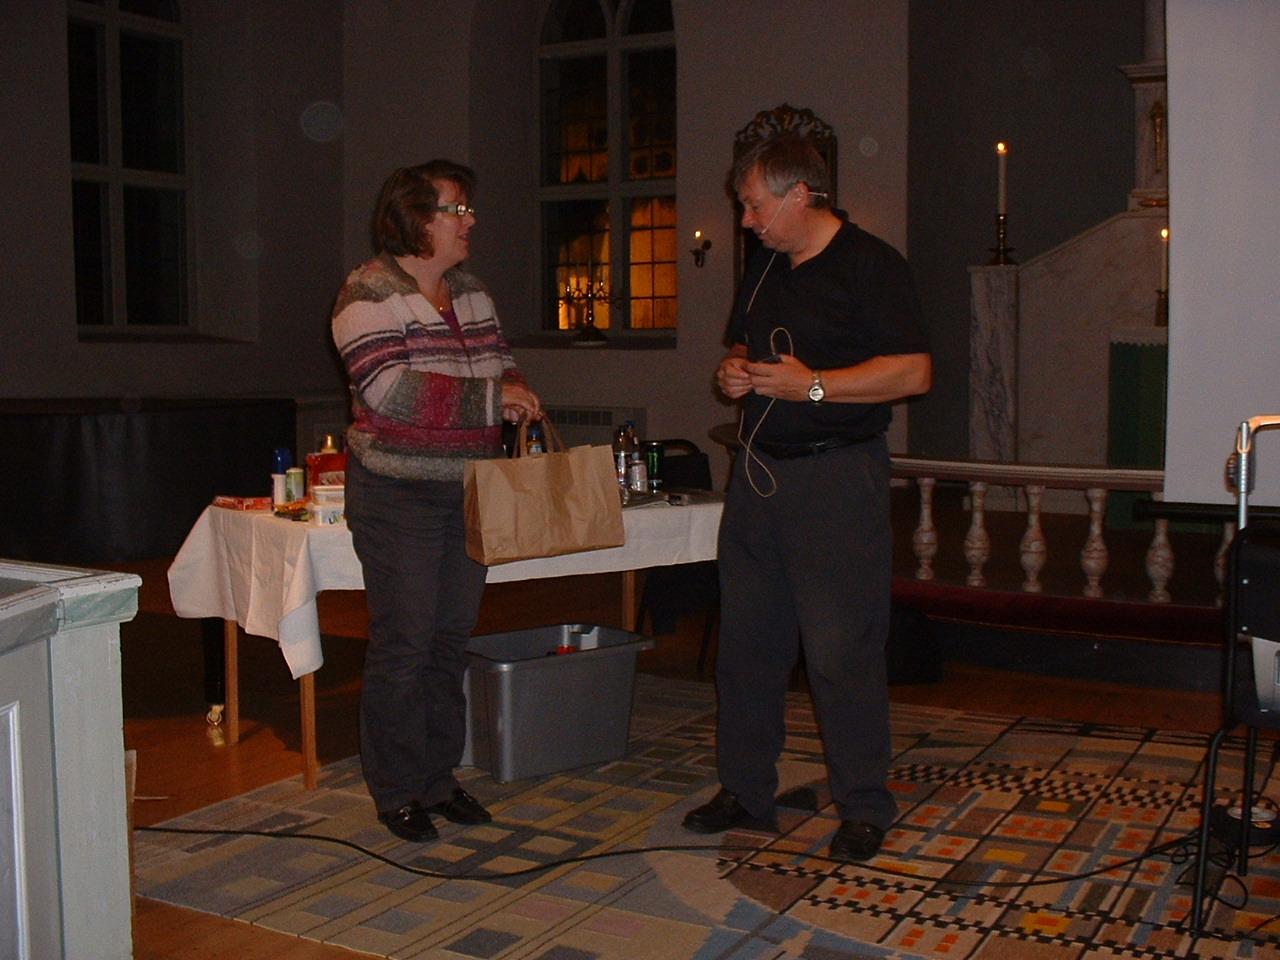 reportage-kyrkan-27-okt-2009-012